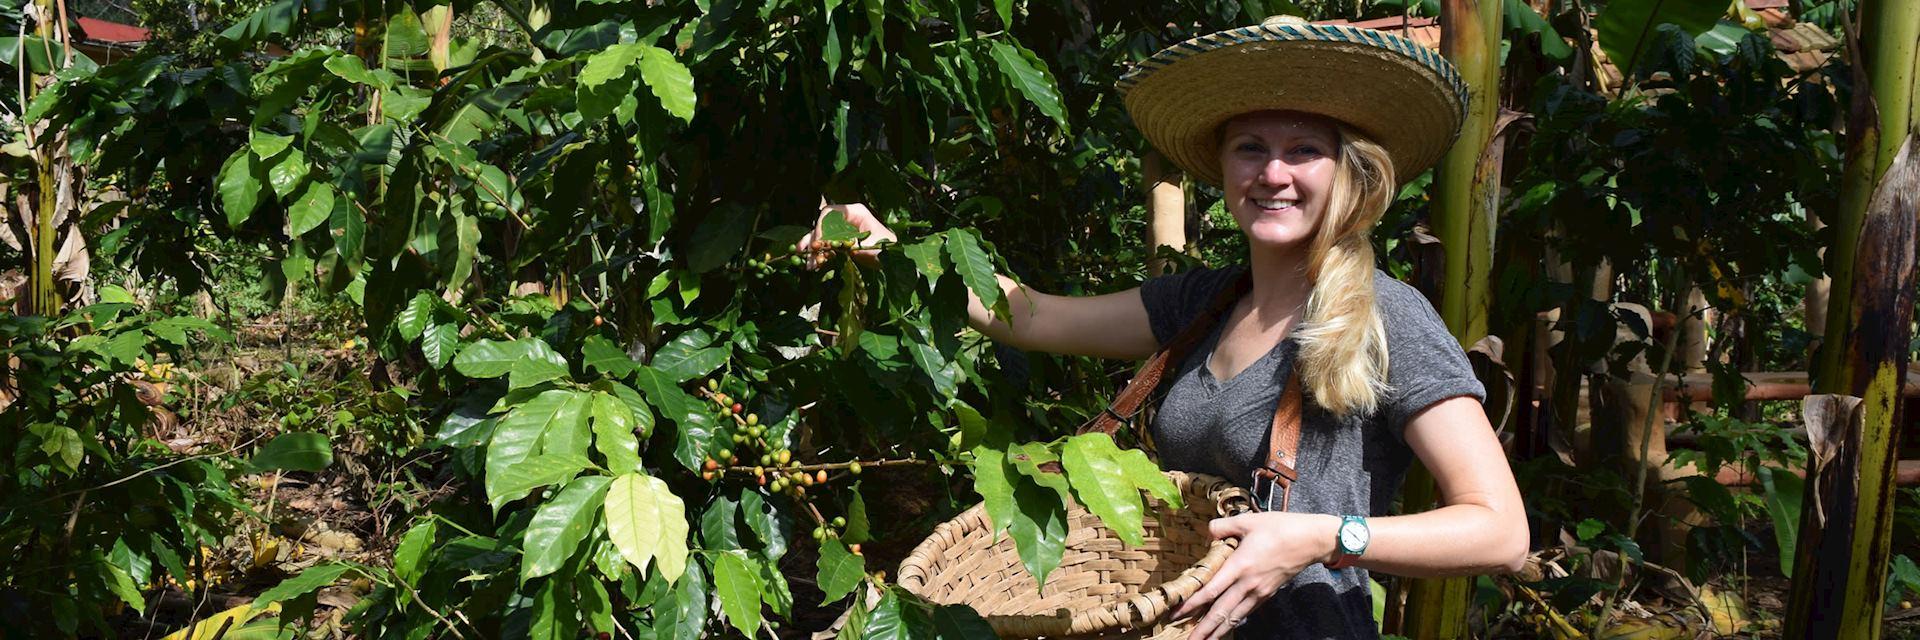 Alison coffee picking, Cuba